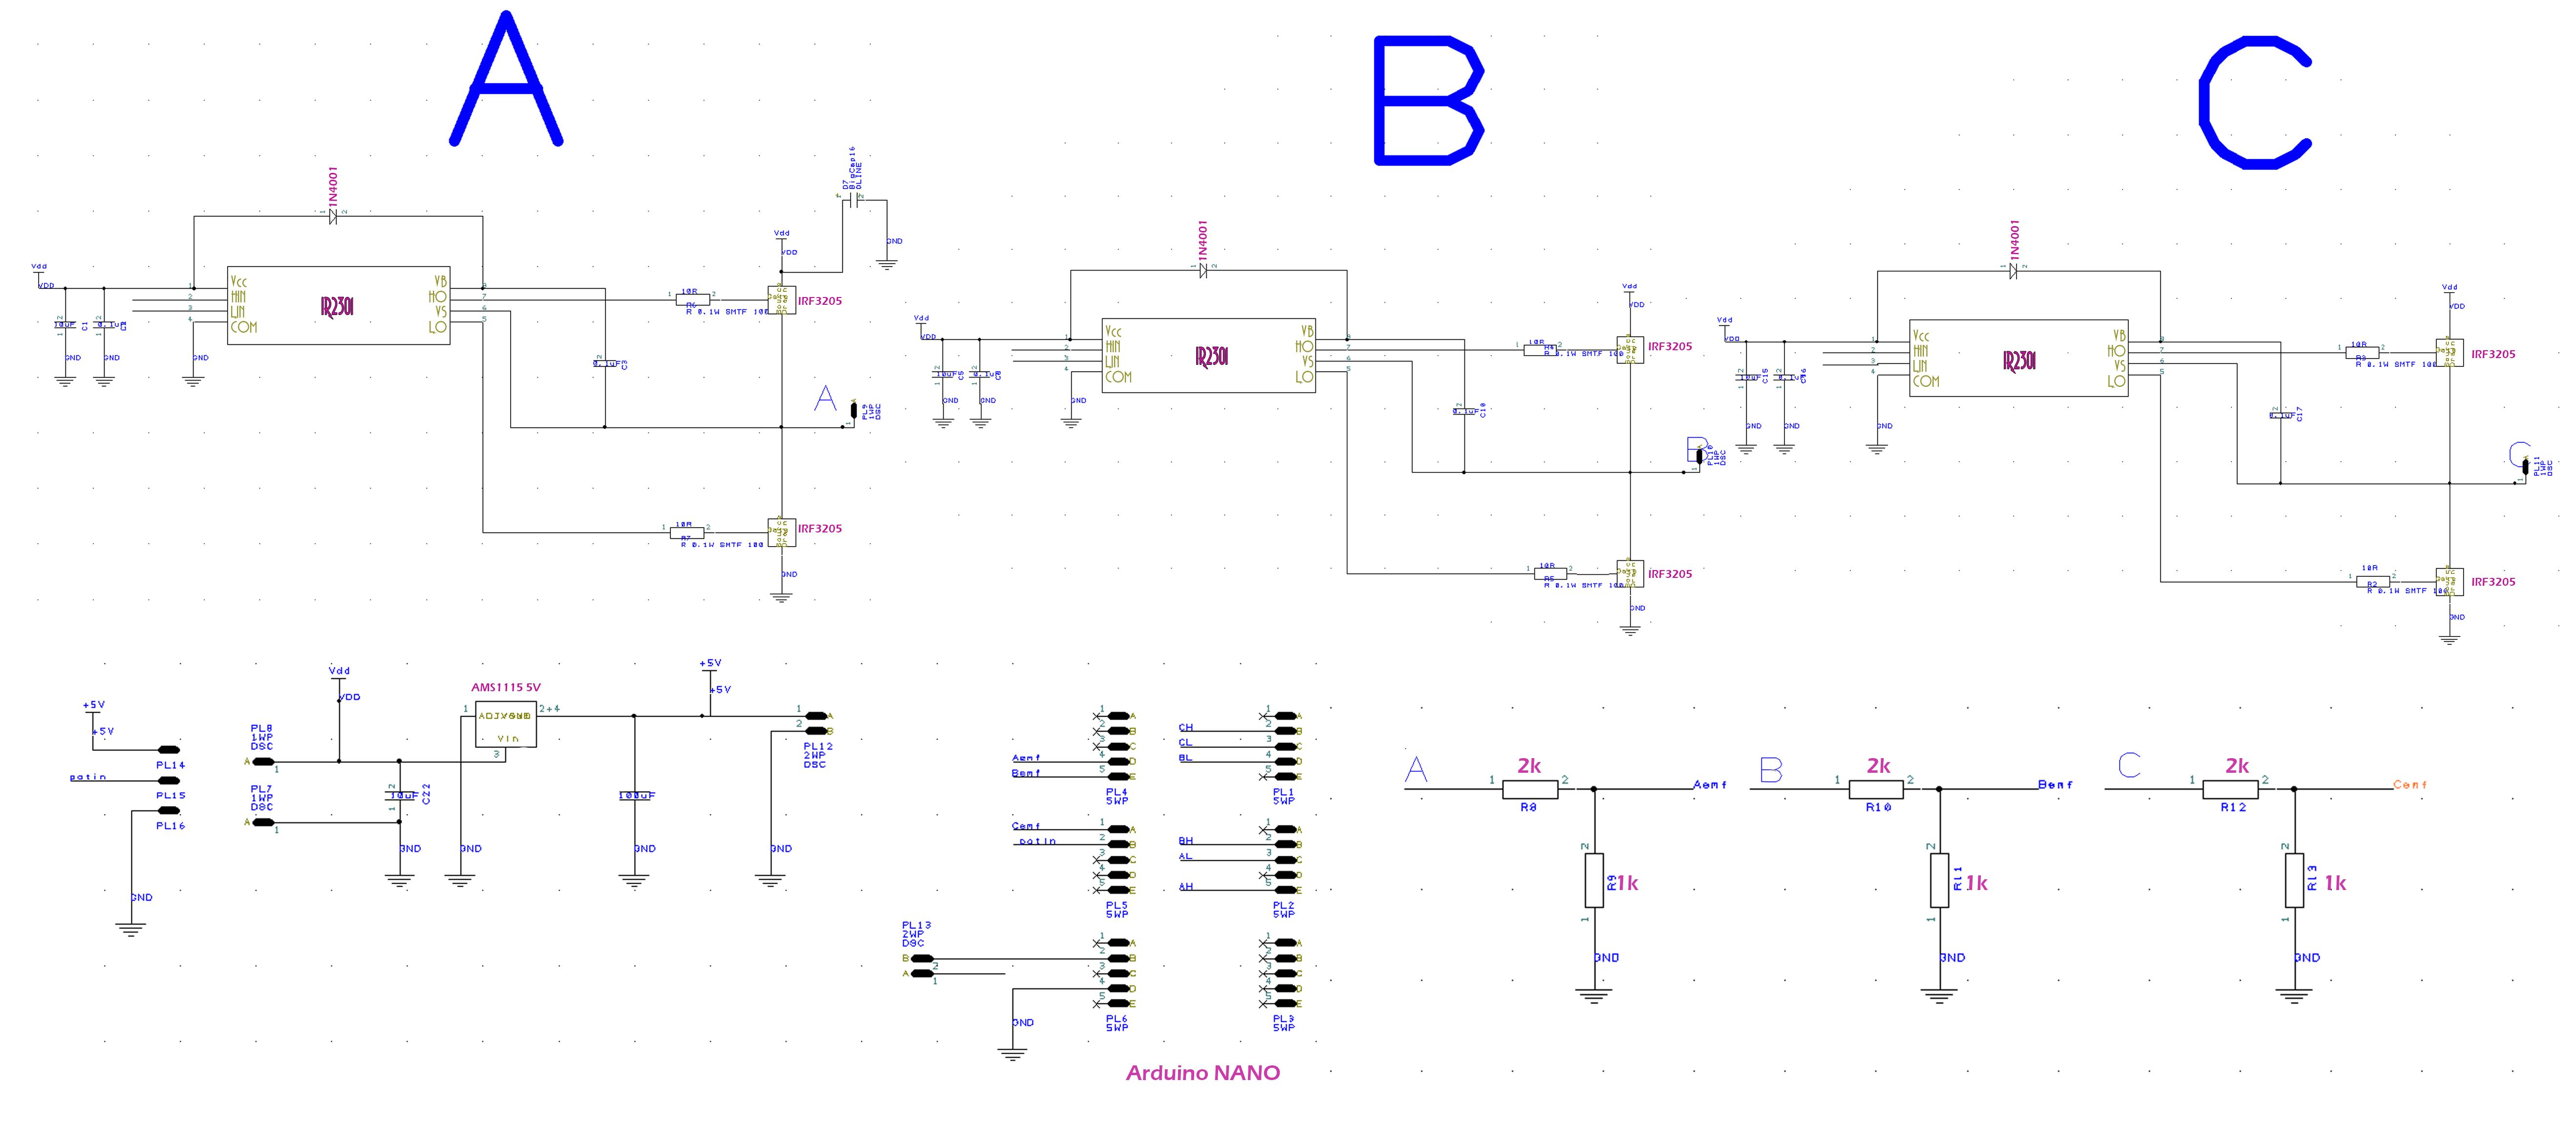 Electronic sd controller with arduino HOMEMADE on arduino relay diagram, arduino schematic pdf, arduino led schematic, arduino board schematic, arduino uno schematic, arduino circuit schematic, speaker schematic, attiny85 schematic, arduino mini schematic, ultrasonic schematic, arduino micro schematic, arduino pinout diagram, arduino pro schematic, arduino lcd schematic, breadboard schematic, arduino ethernet schematic, arduino r3 schematic, photocell schematic, arduino shield schematic, arduino mega schematic,